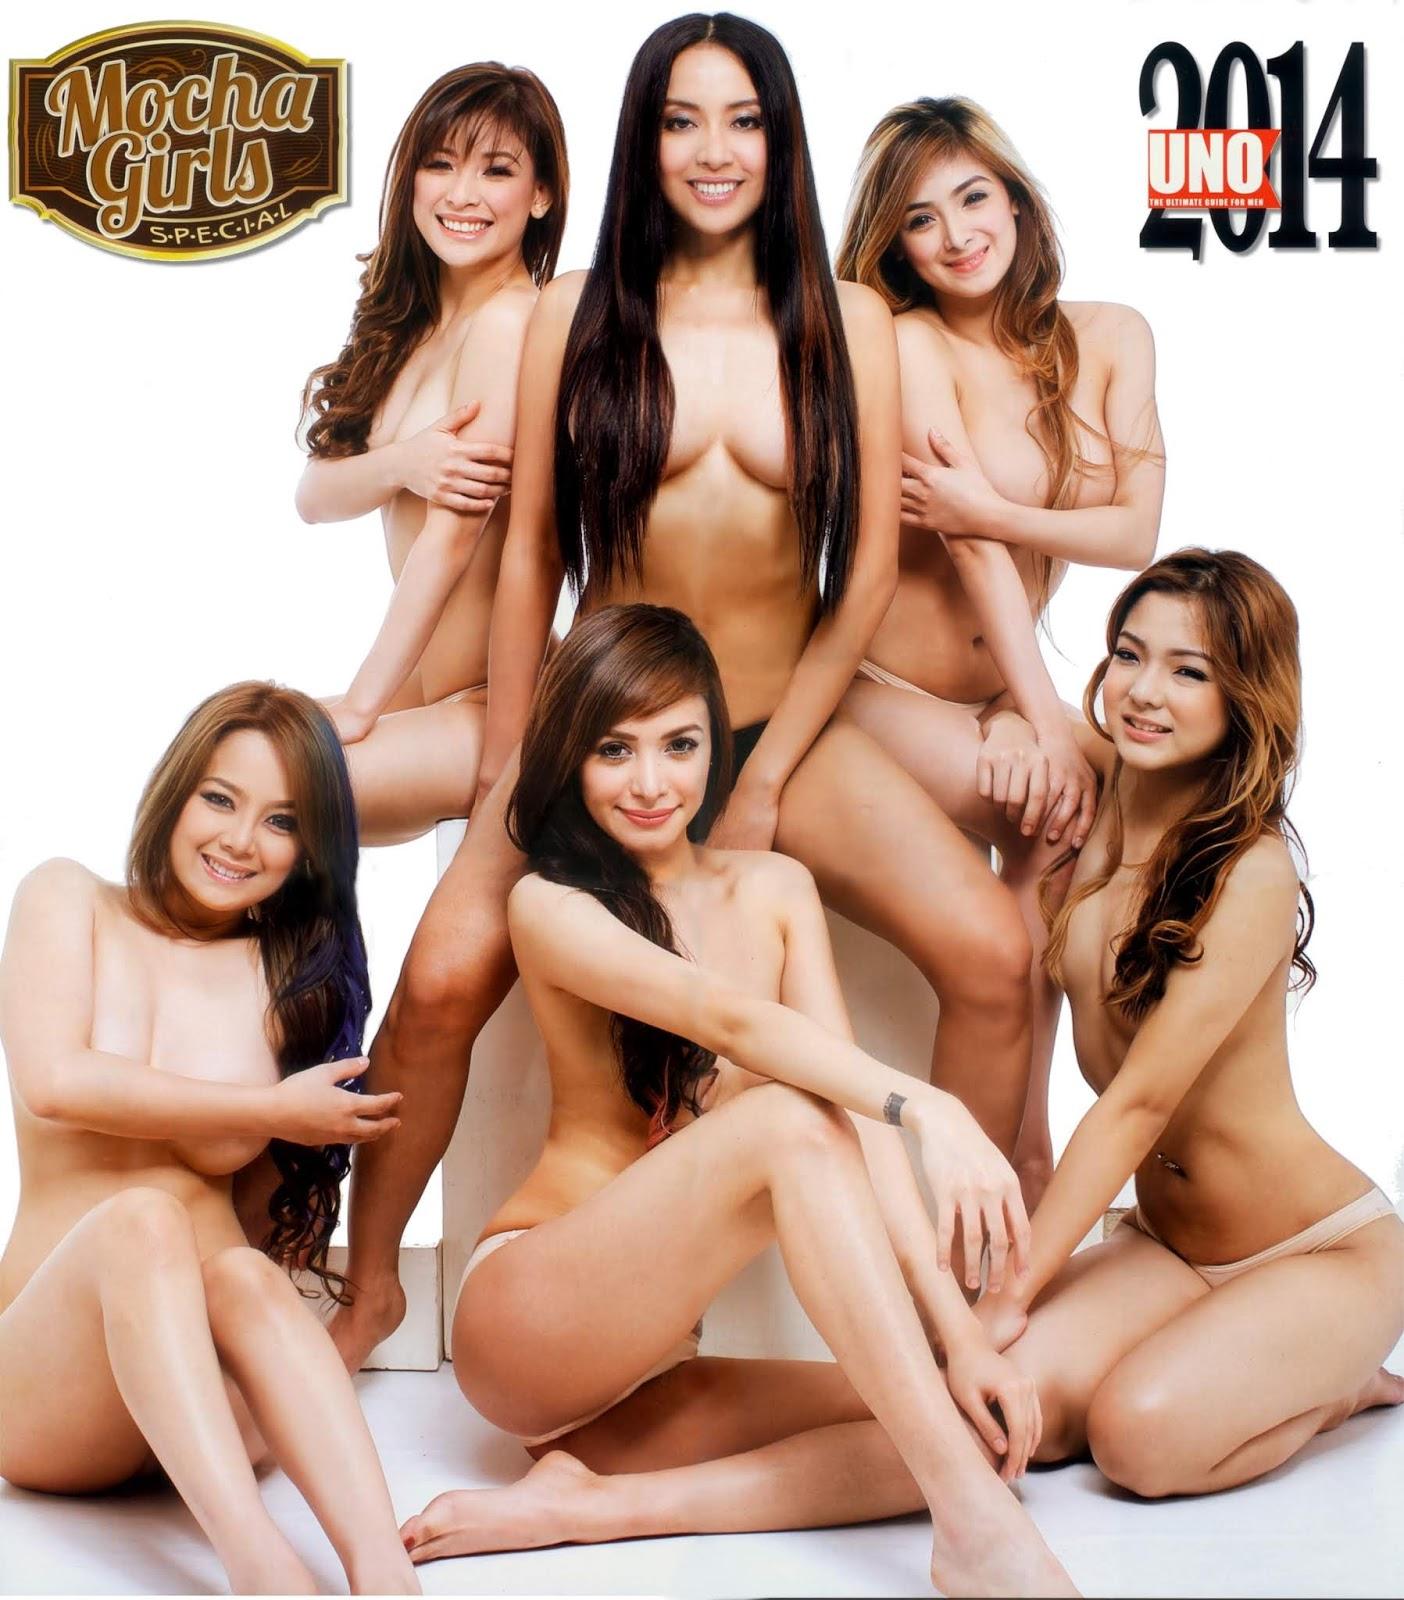 mocha girls uno magazine hot topless pics